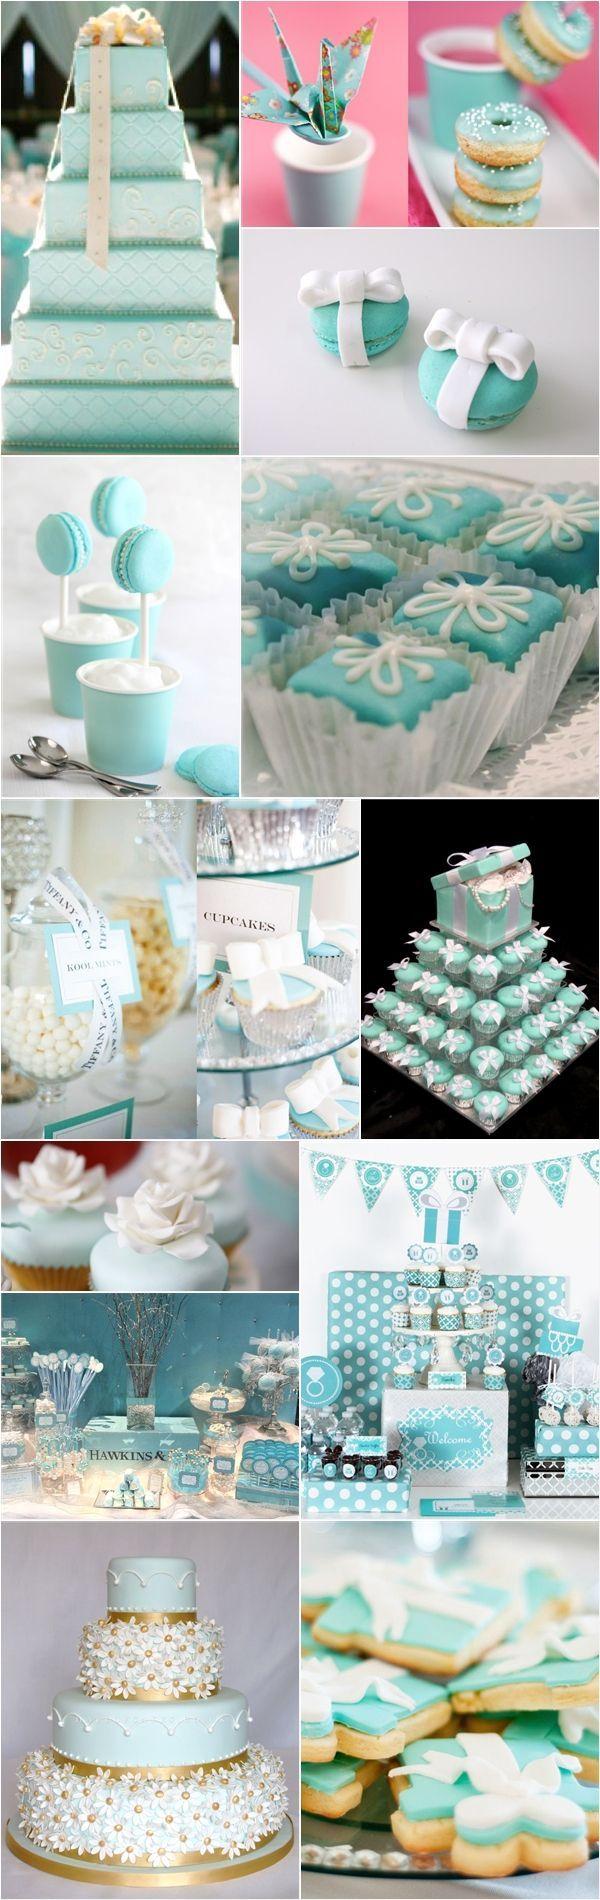 Praise Wedding » Wedding Inspiration and Planning » Tiffany-inspired Wedding Designs